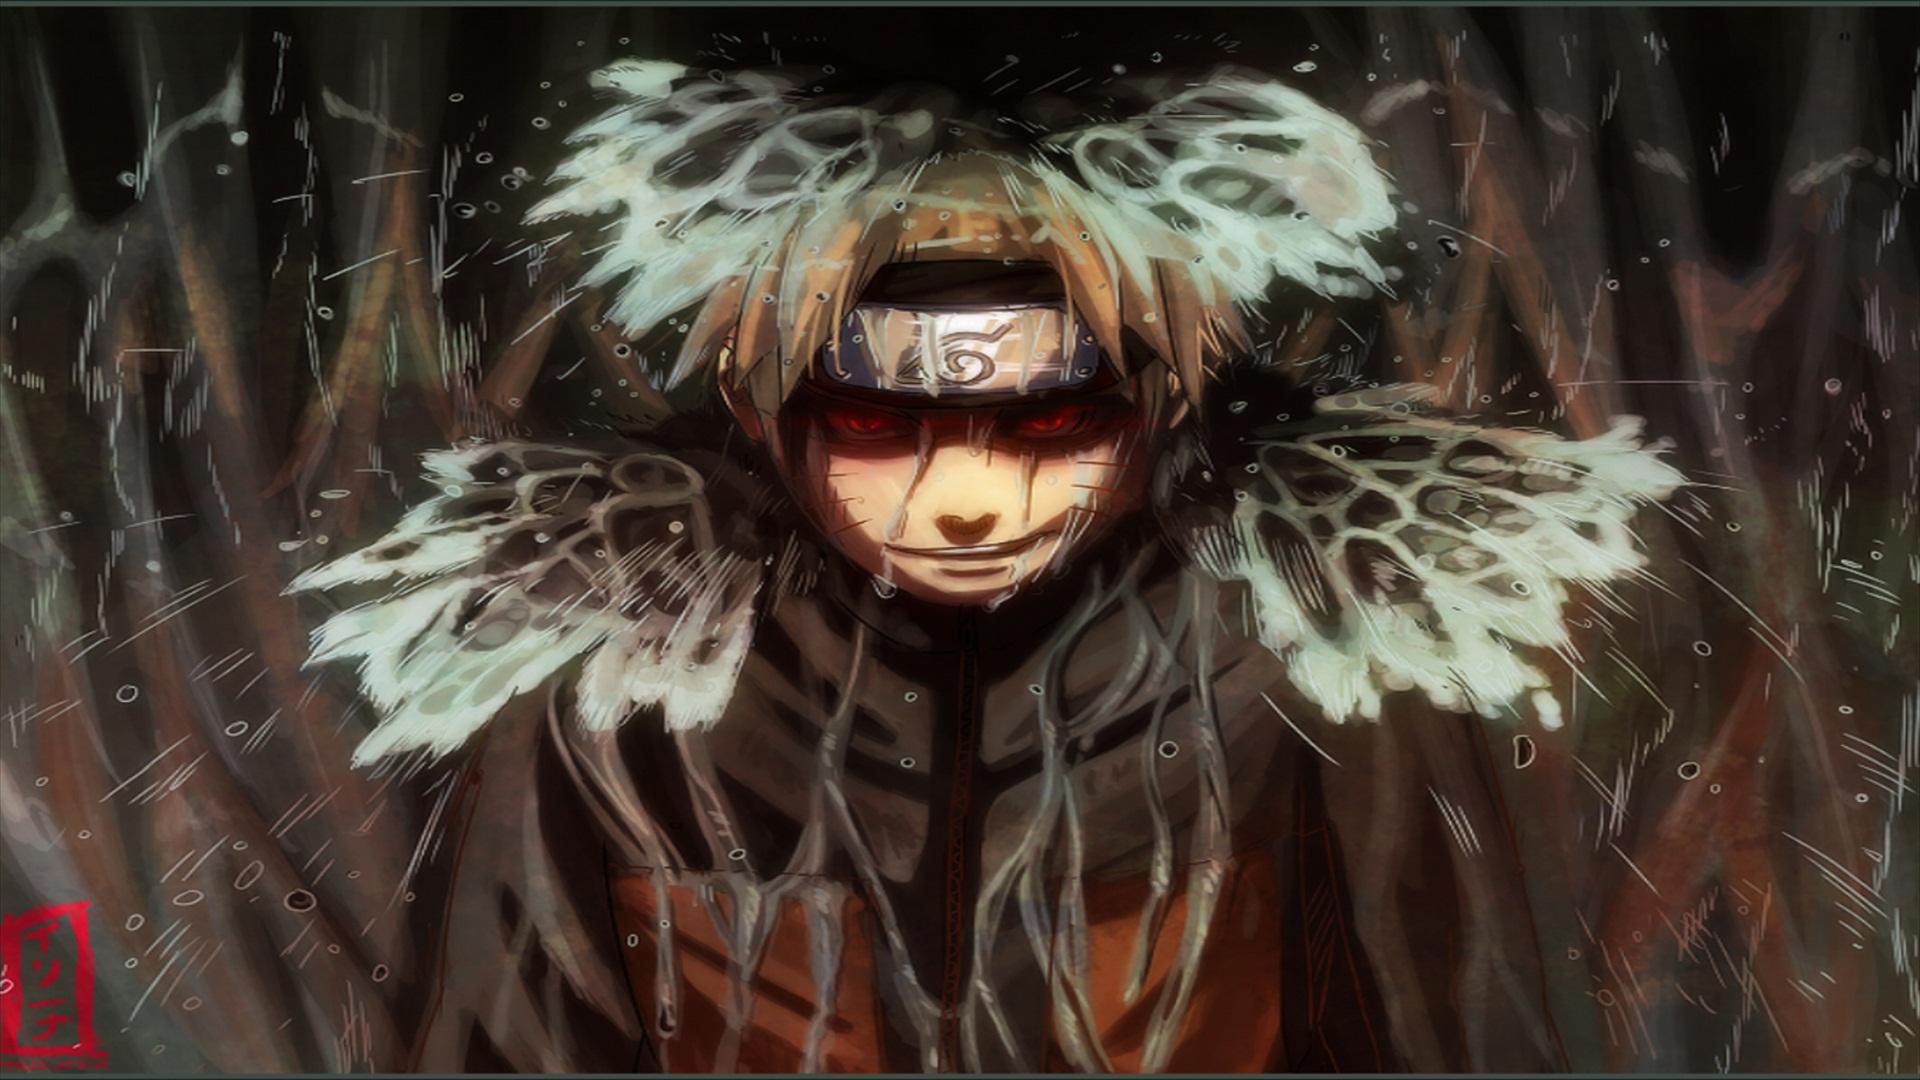 [41+] Naruto Wallpaper 1920x1080 on WallpaperSafari